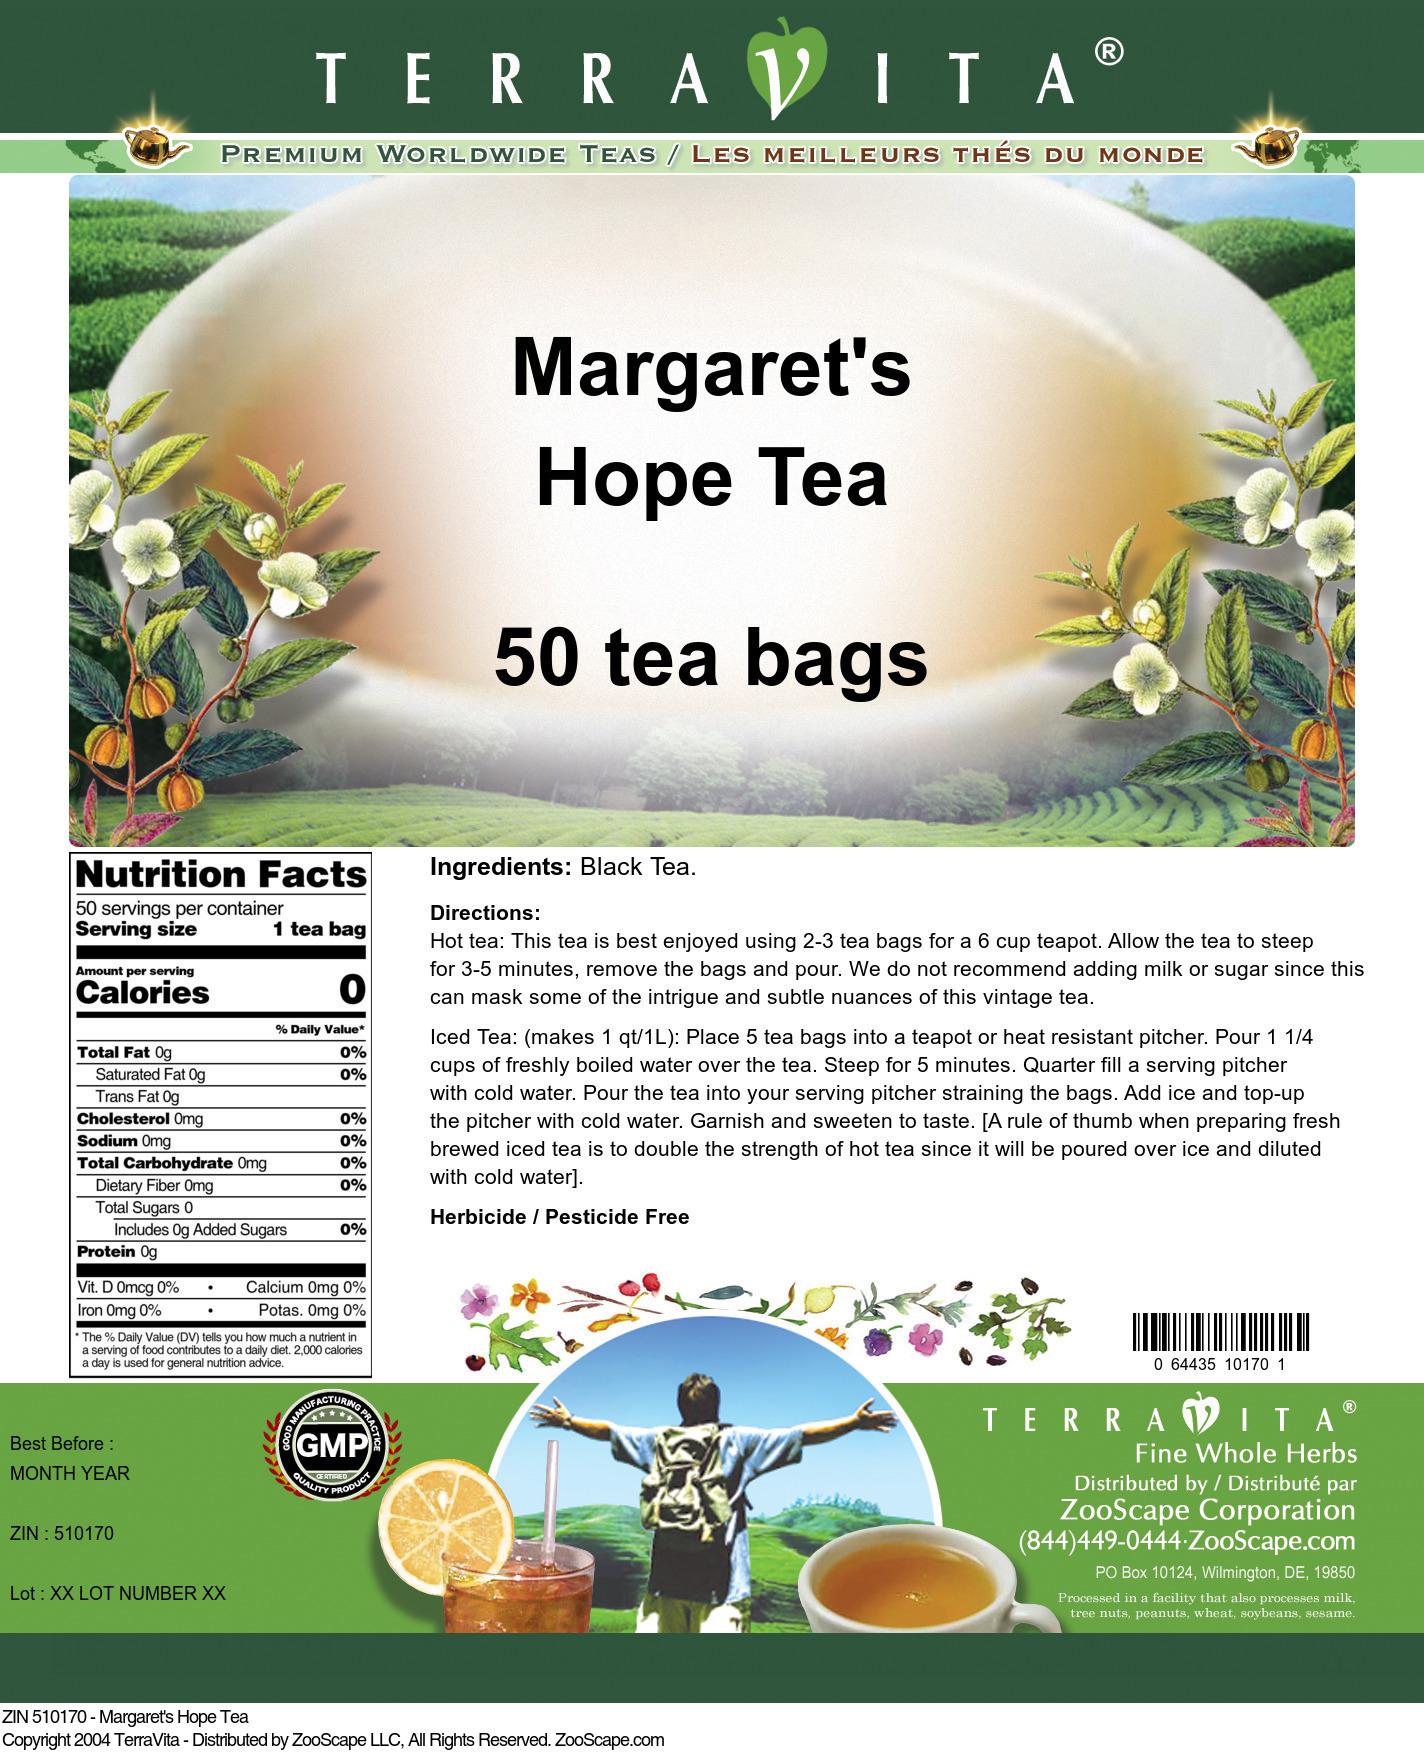 Margaret's Hope Tea